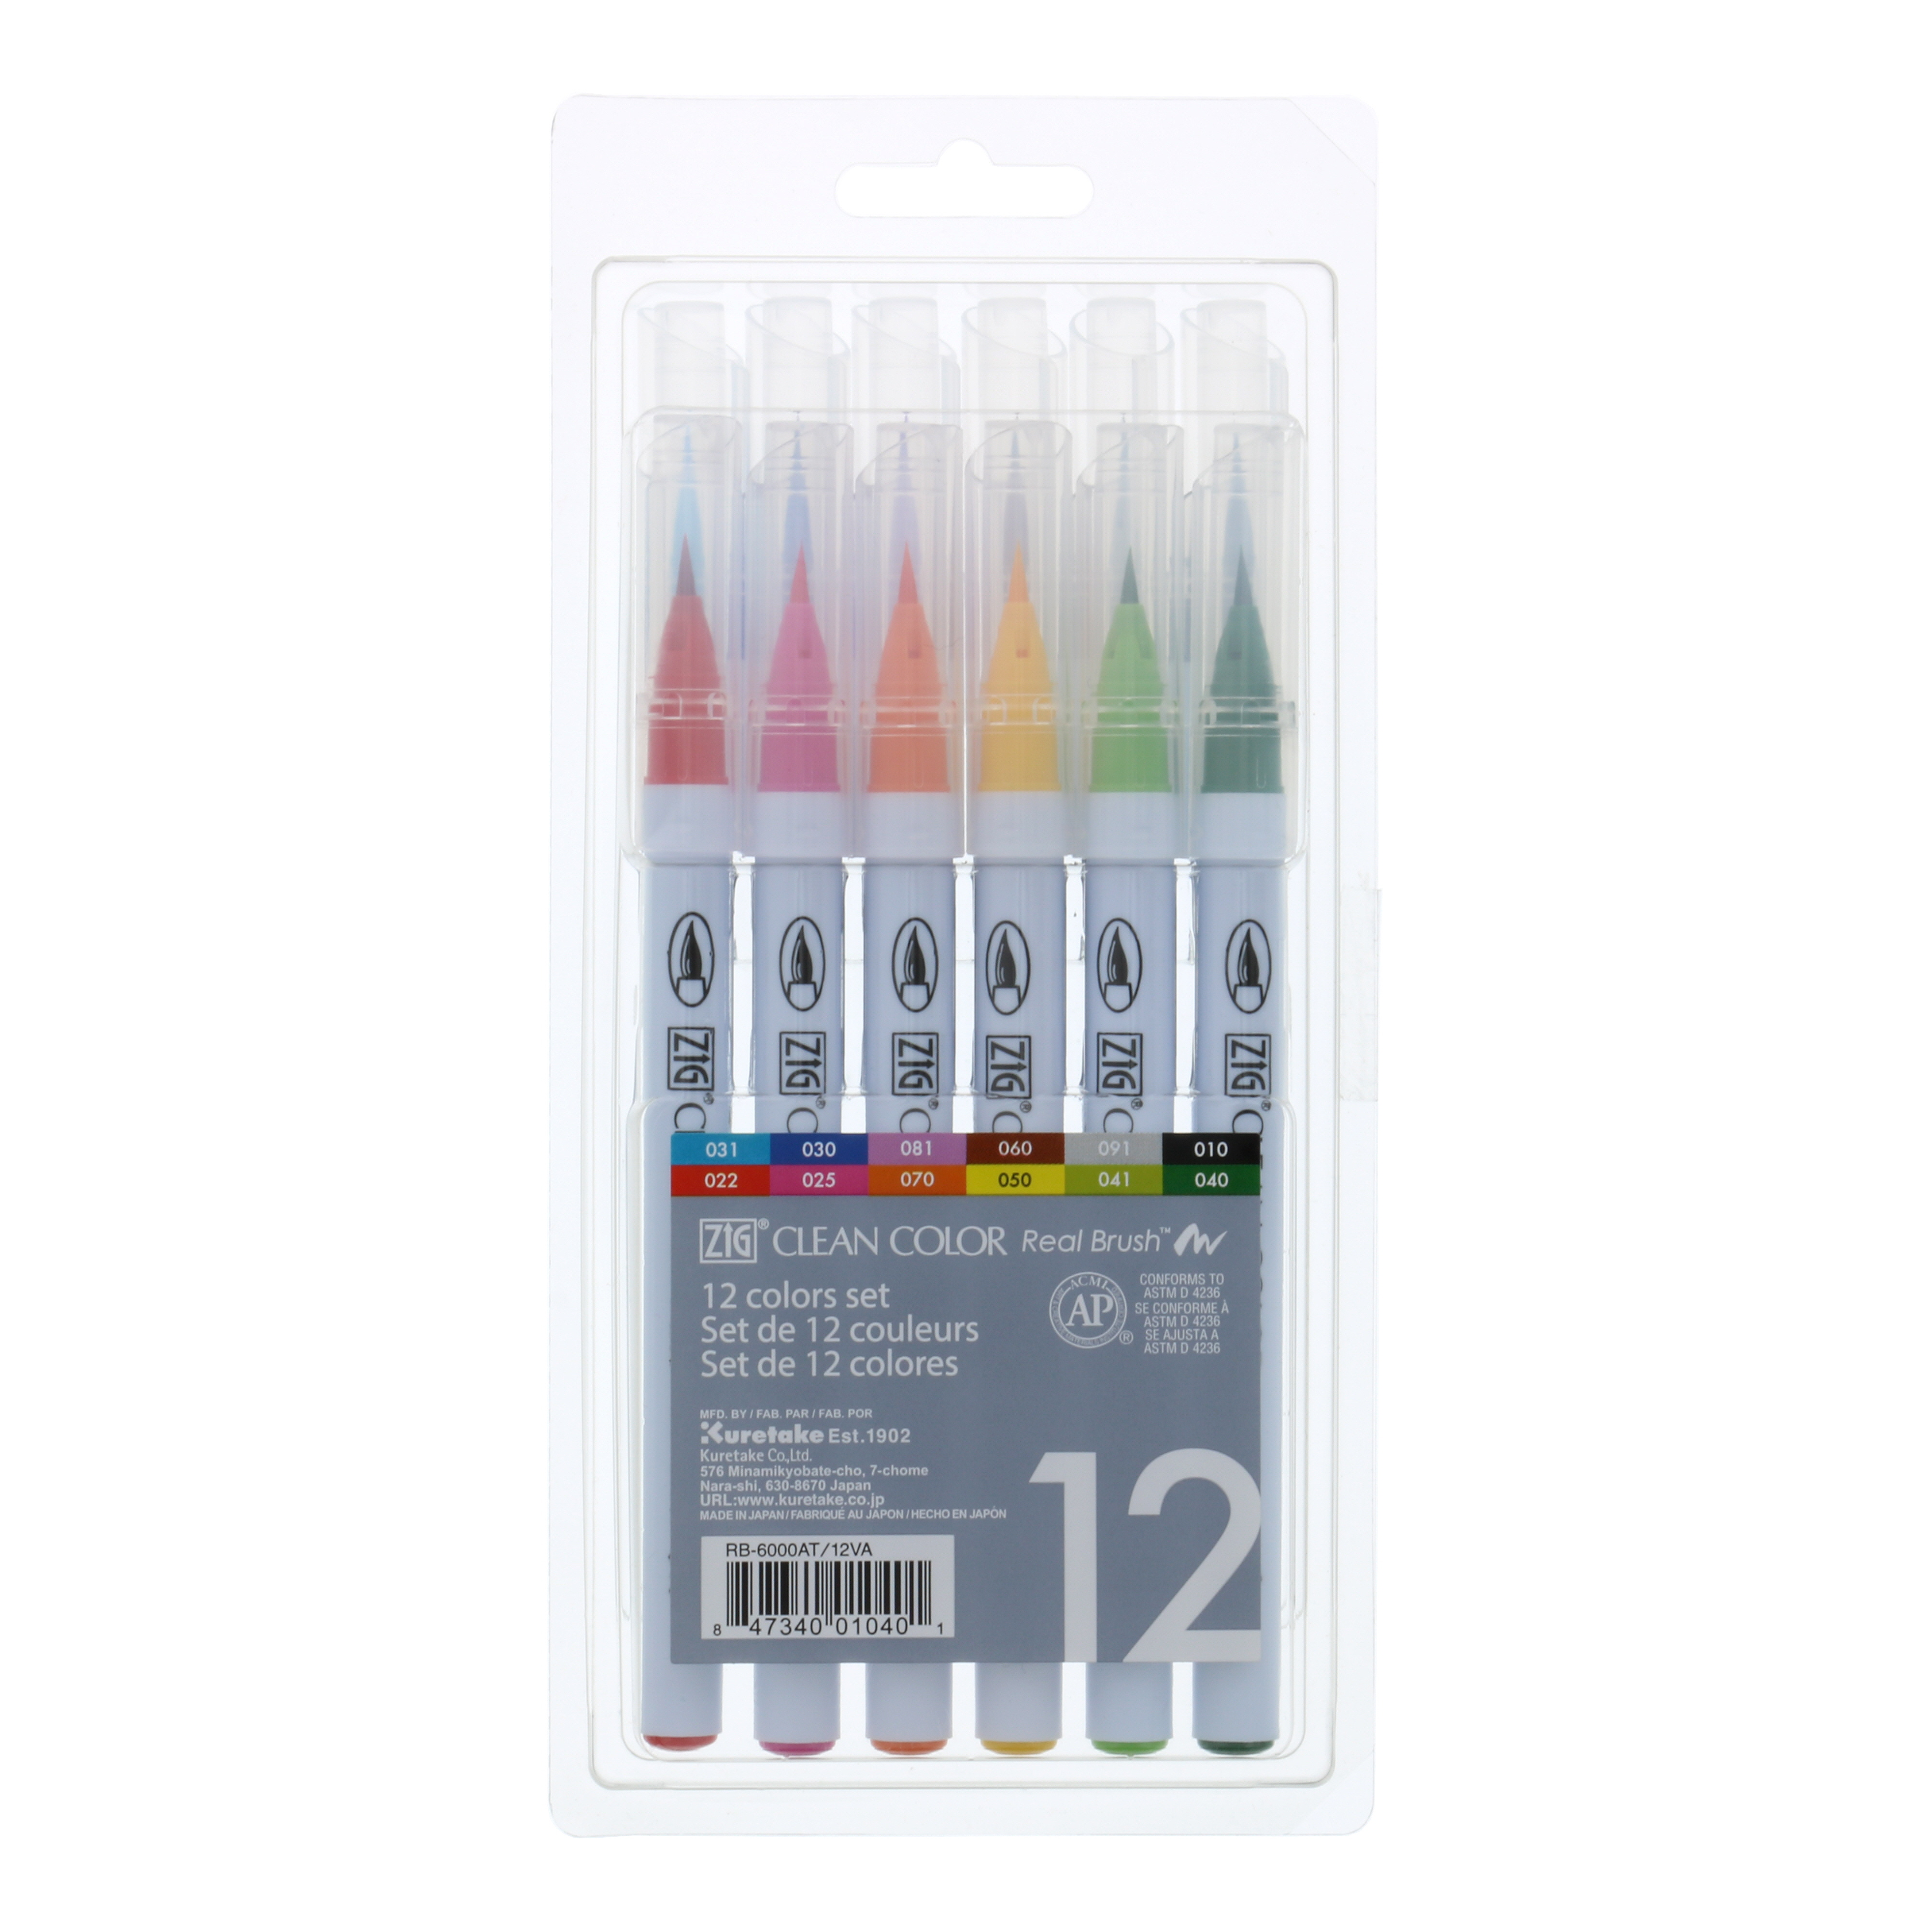 card making mix media Zig Clean Color Real Brush 12 color set brush marker watercolor pens by Kuretake for art journaling paper crafting